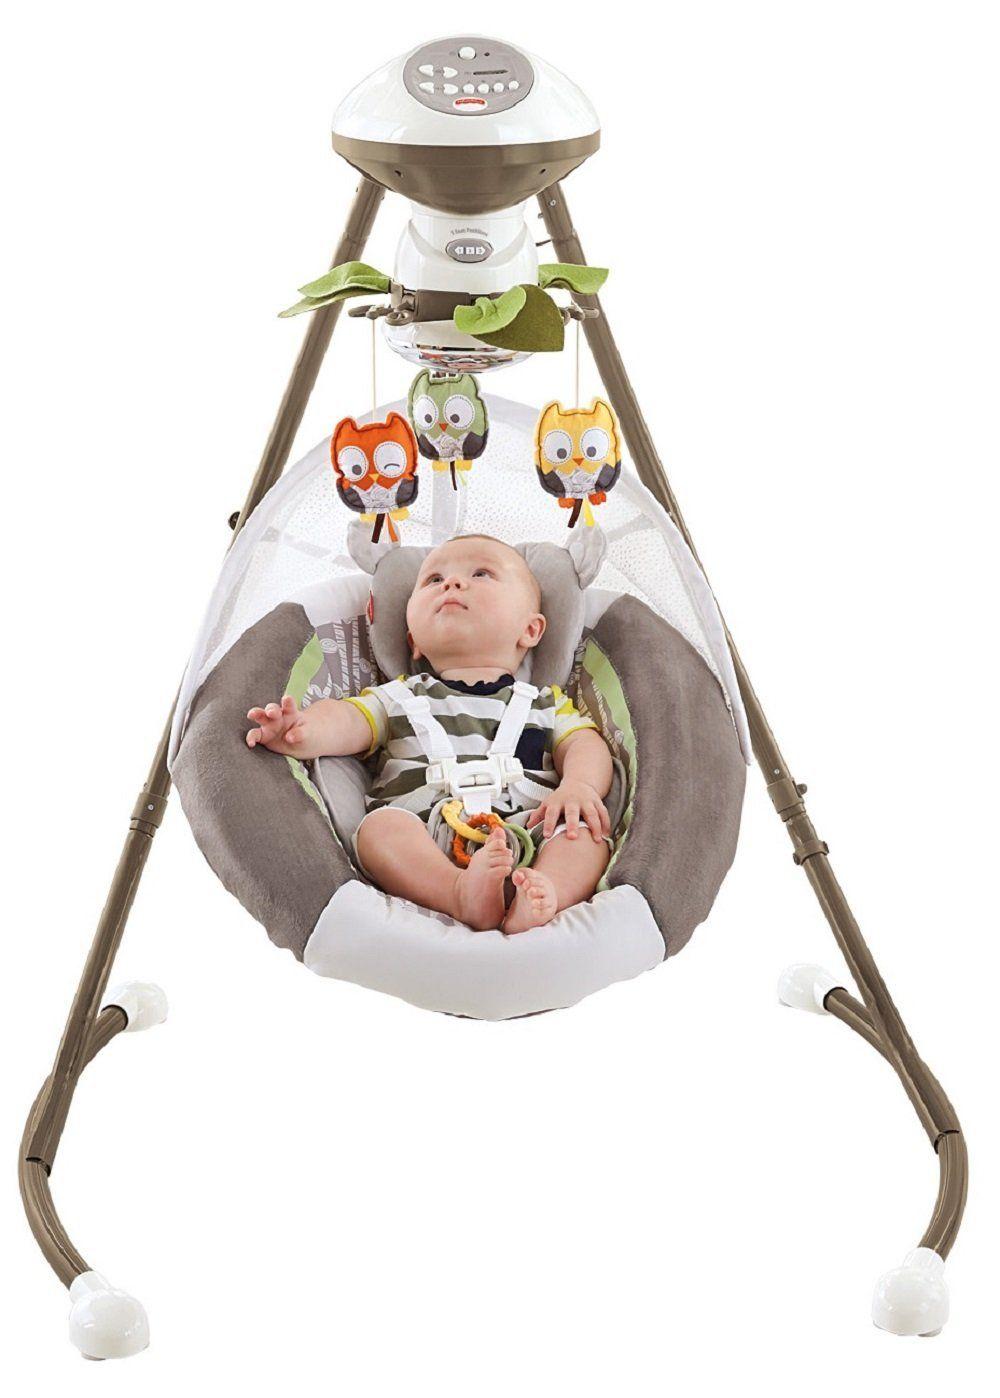 Pin de HiFiveBaby en Baby Swing For Small Spaces | Pinterest